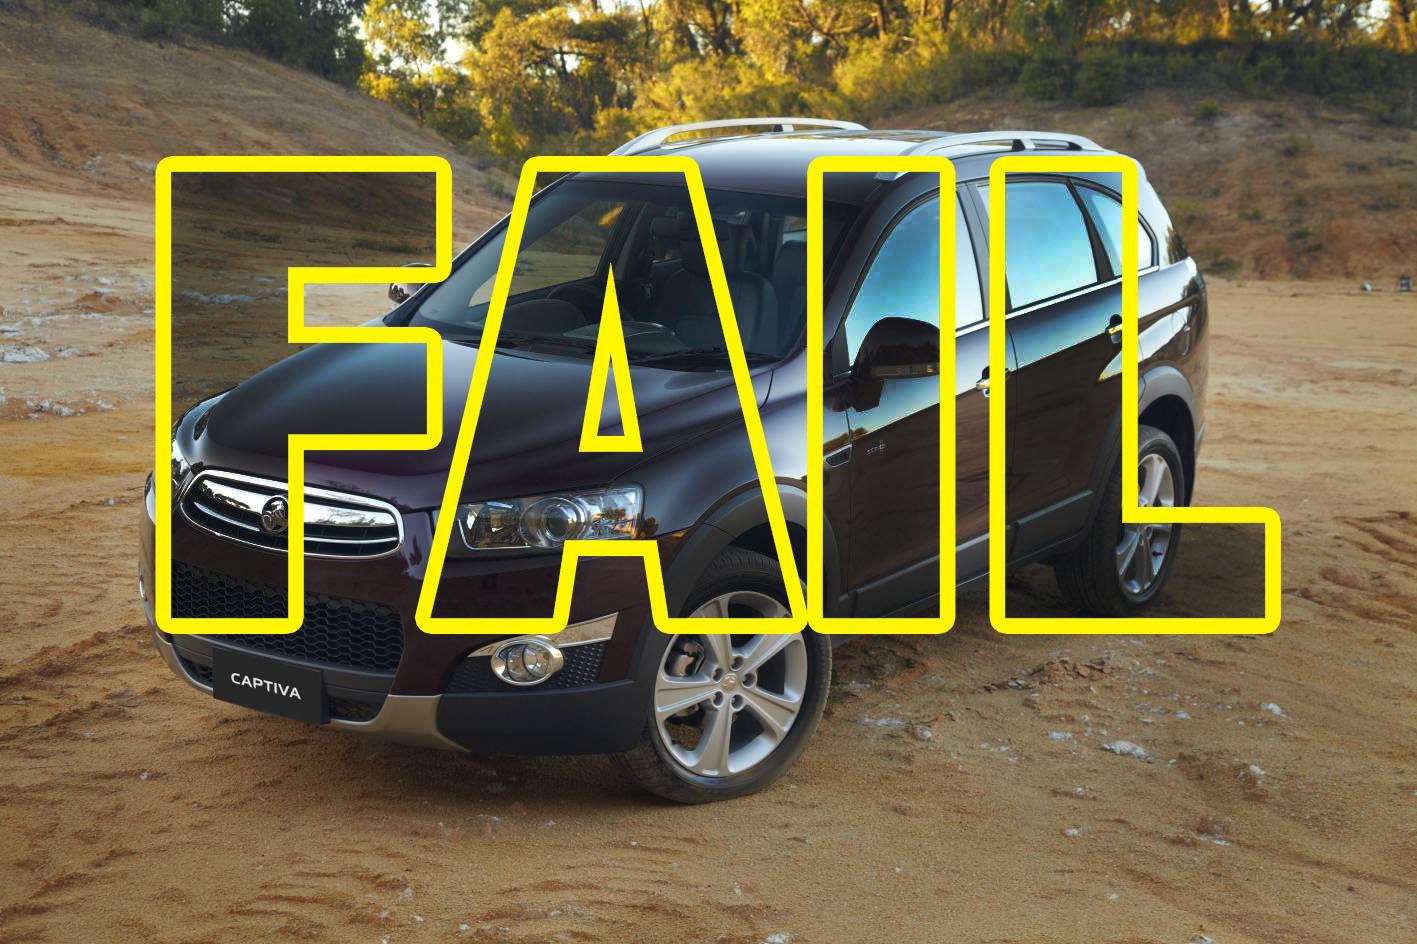 The Holden Captiva is one of the worst vehicles on Australian roads